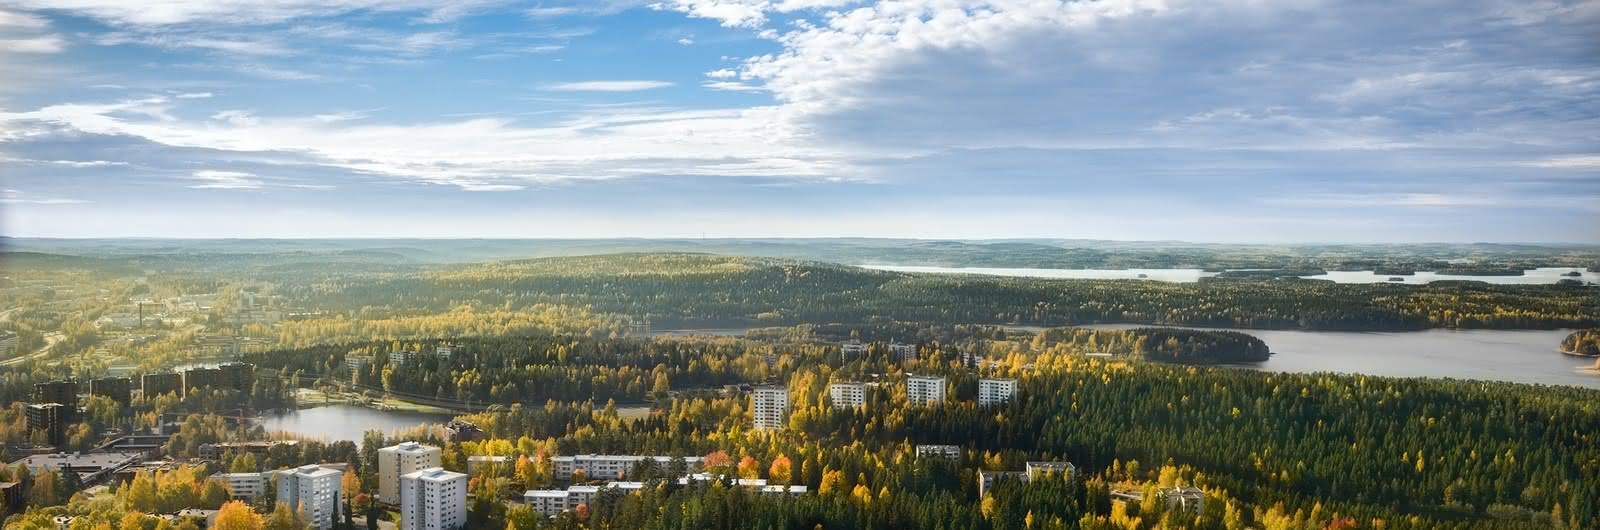 kuopio city header